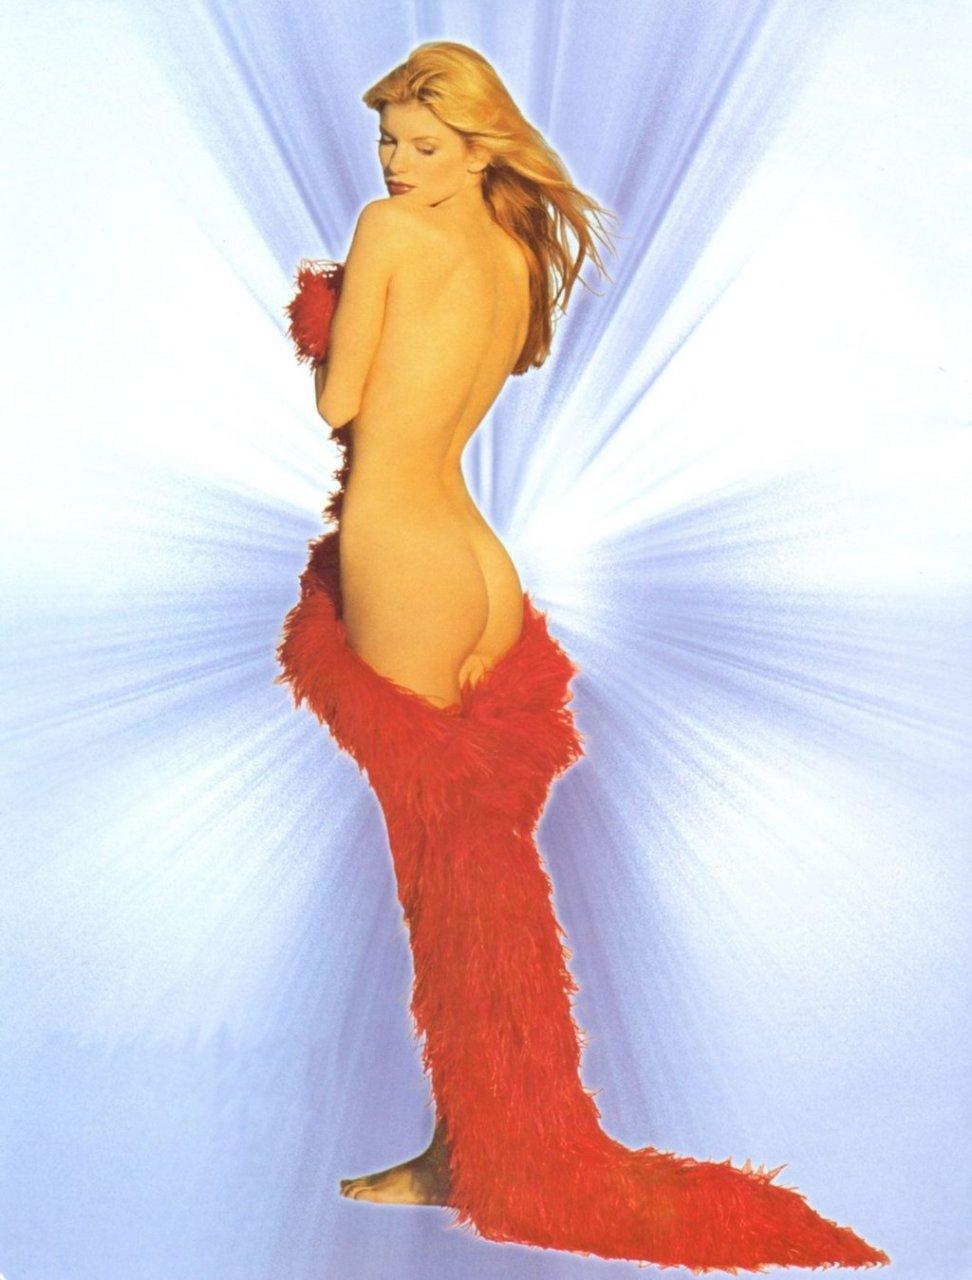 Marisa-Miller-Nude-TheFappeningBlog.com-45-1024x1348.jpg